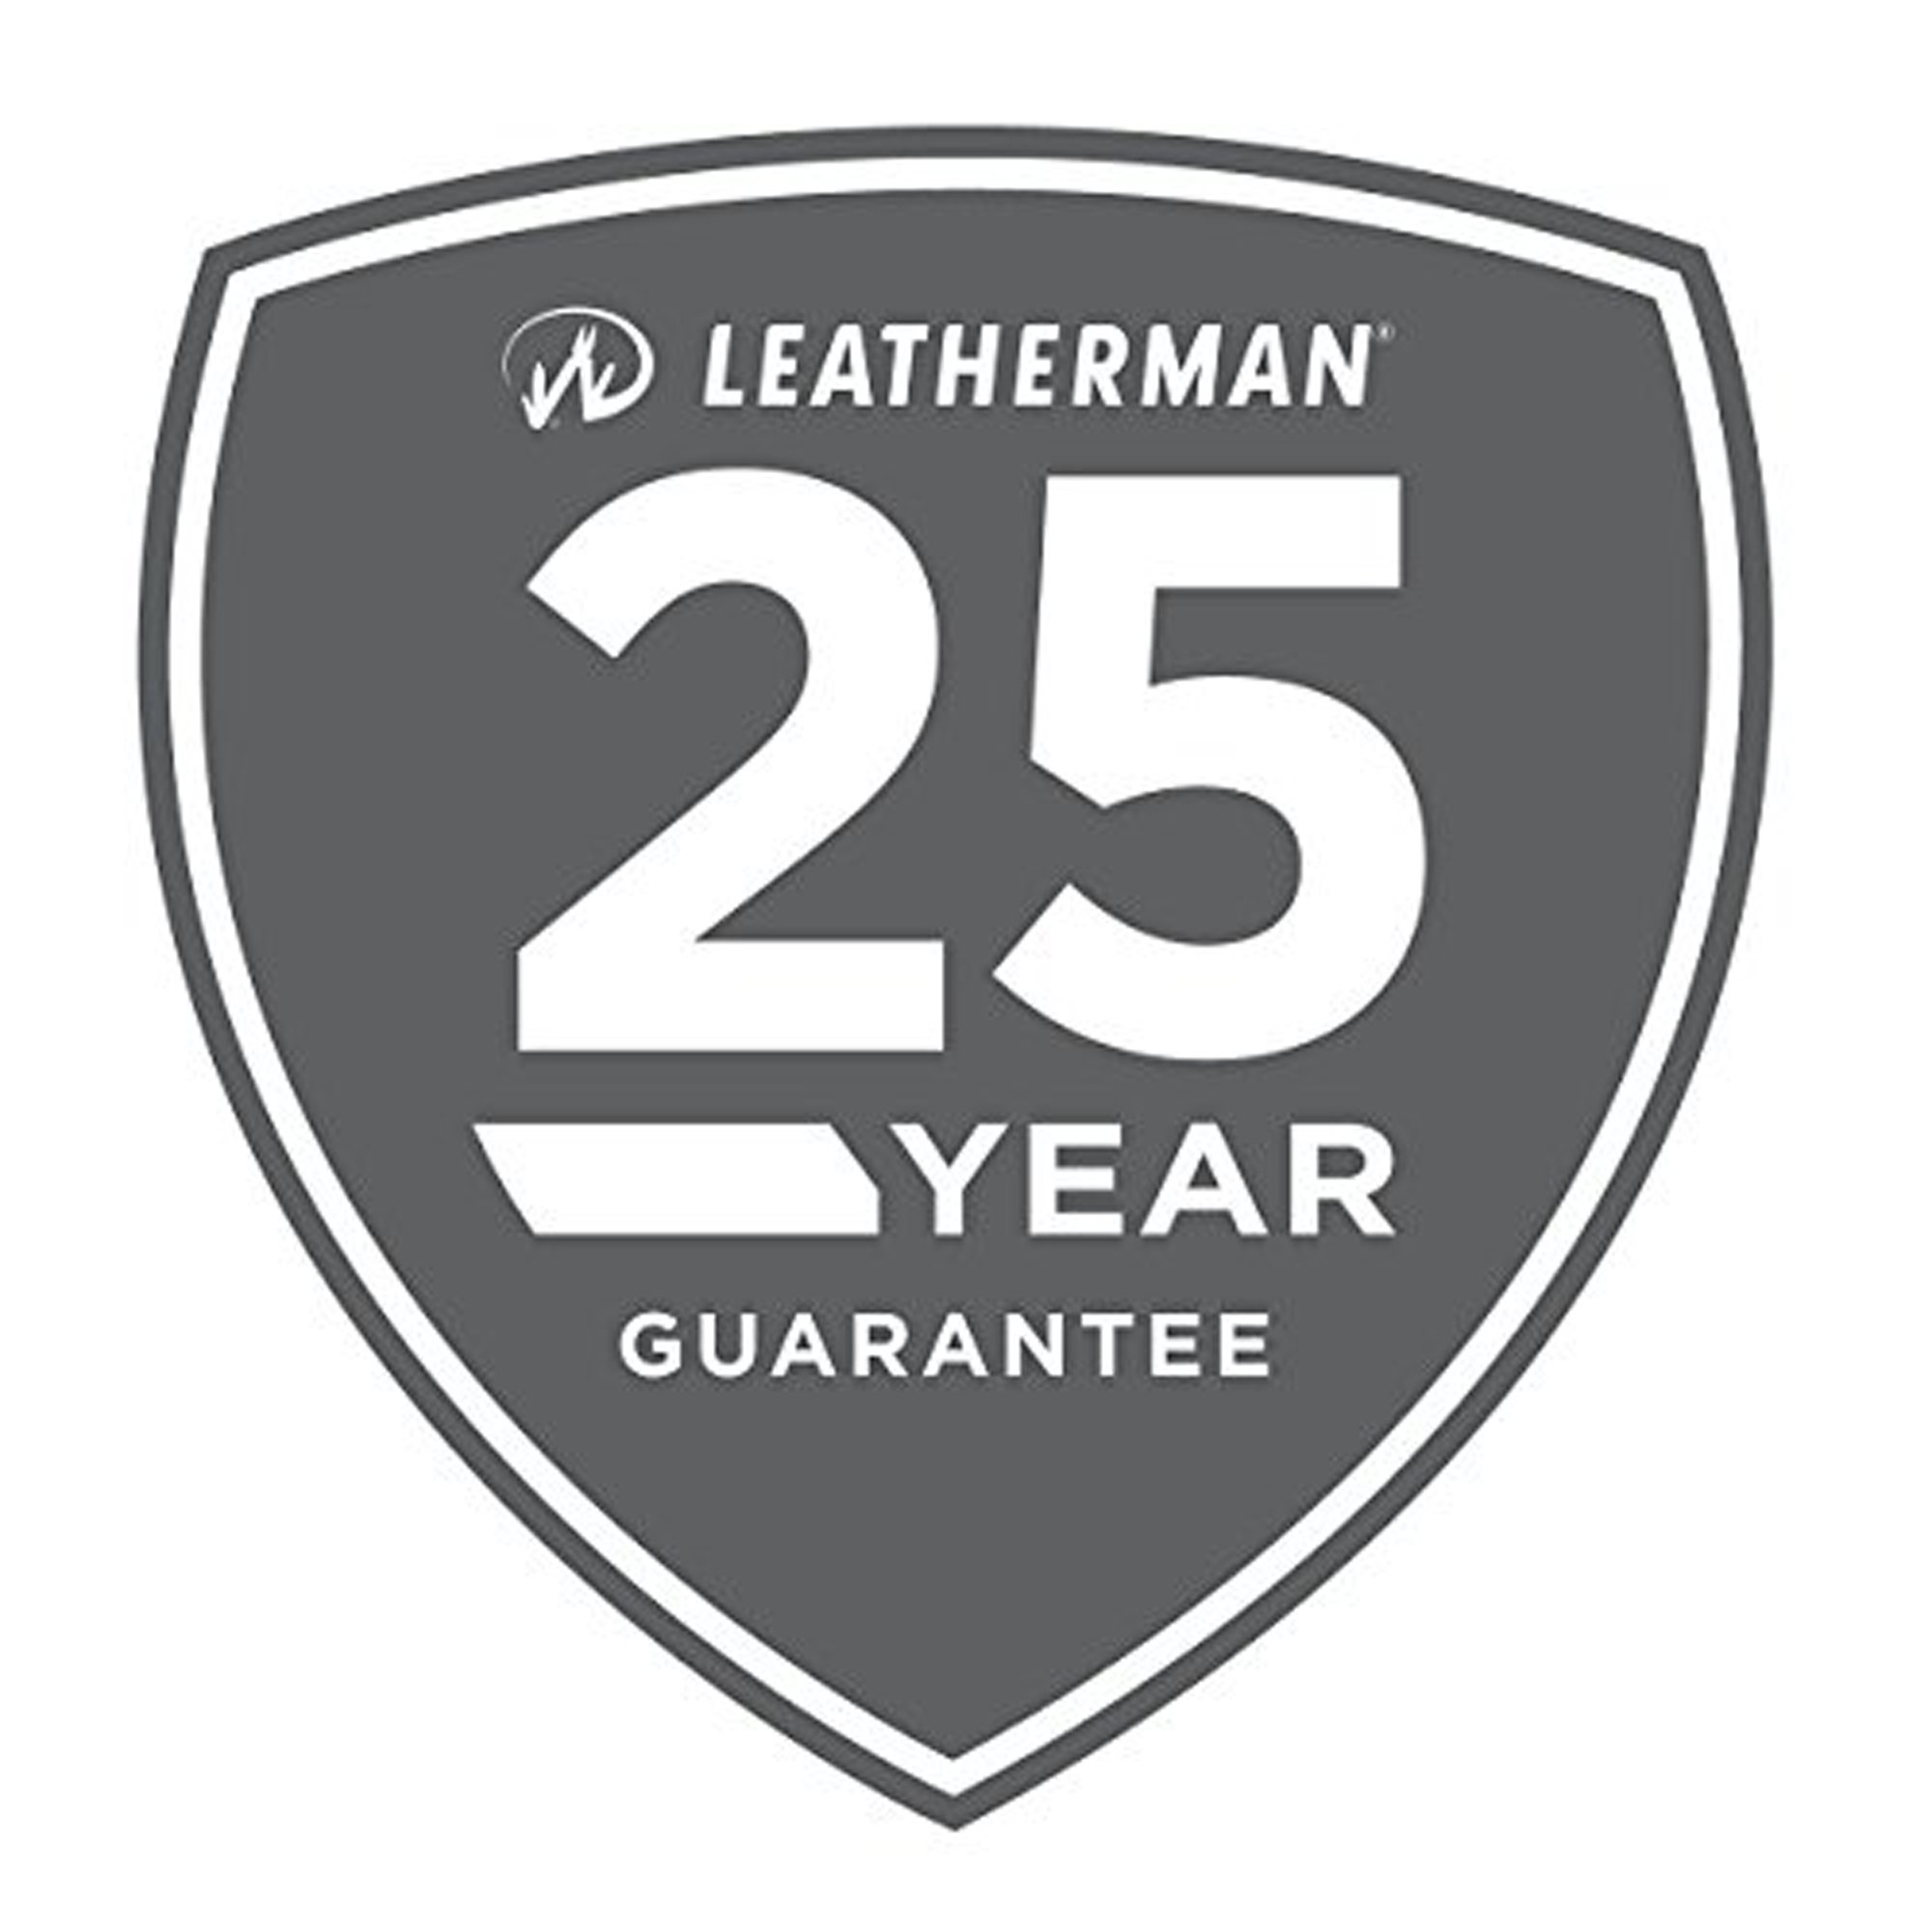 LEATHERMAN - Crater C33X Folding Knife, Black